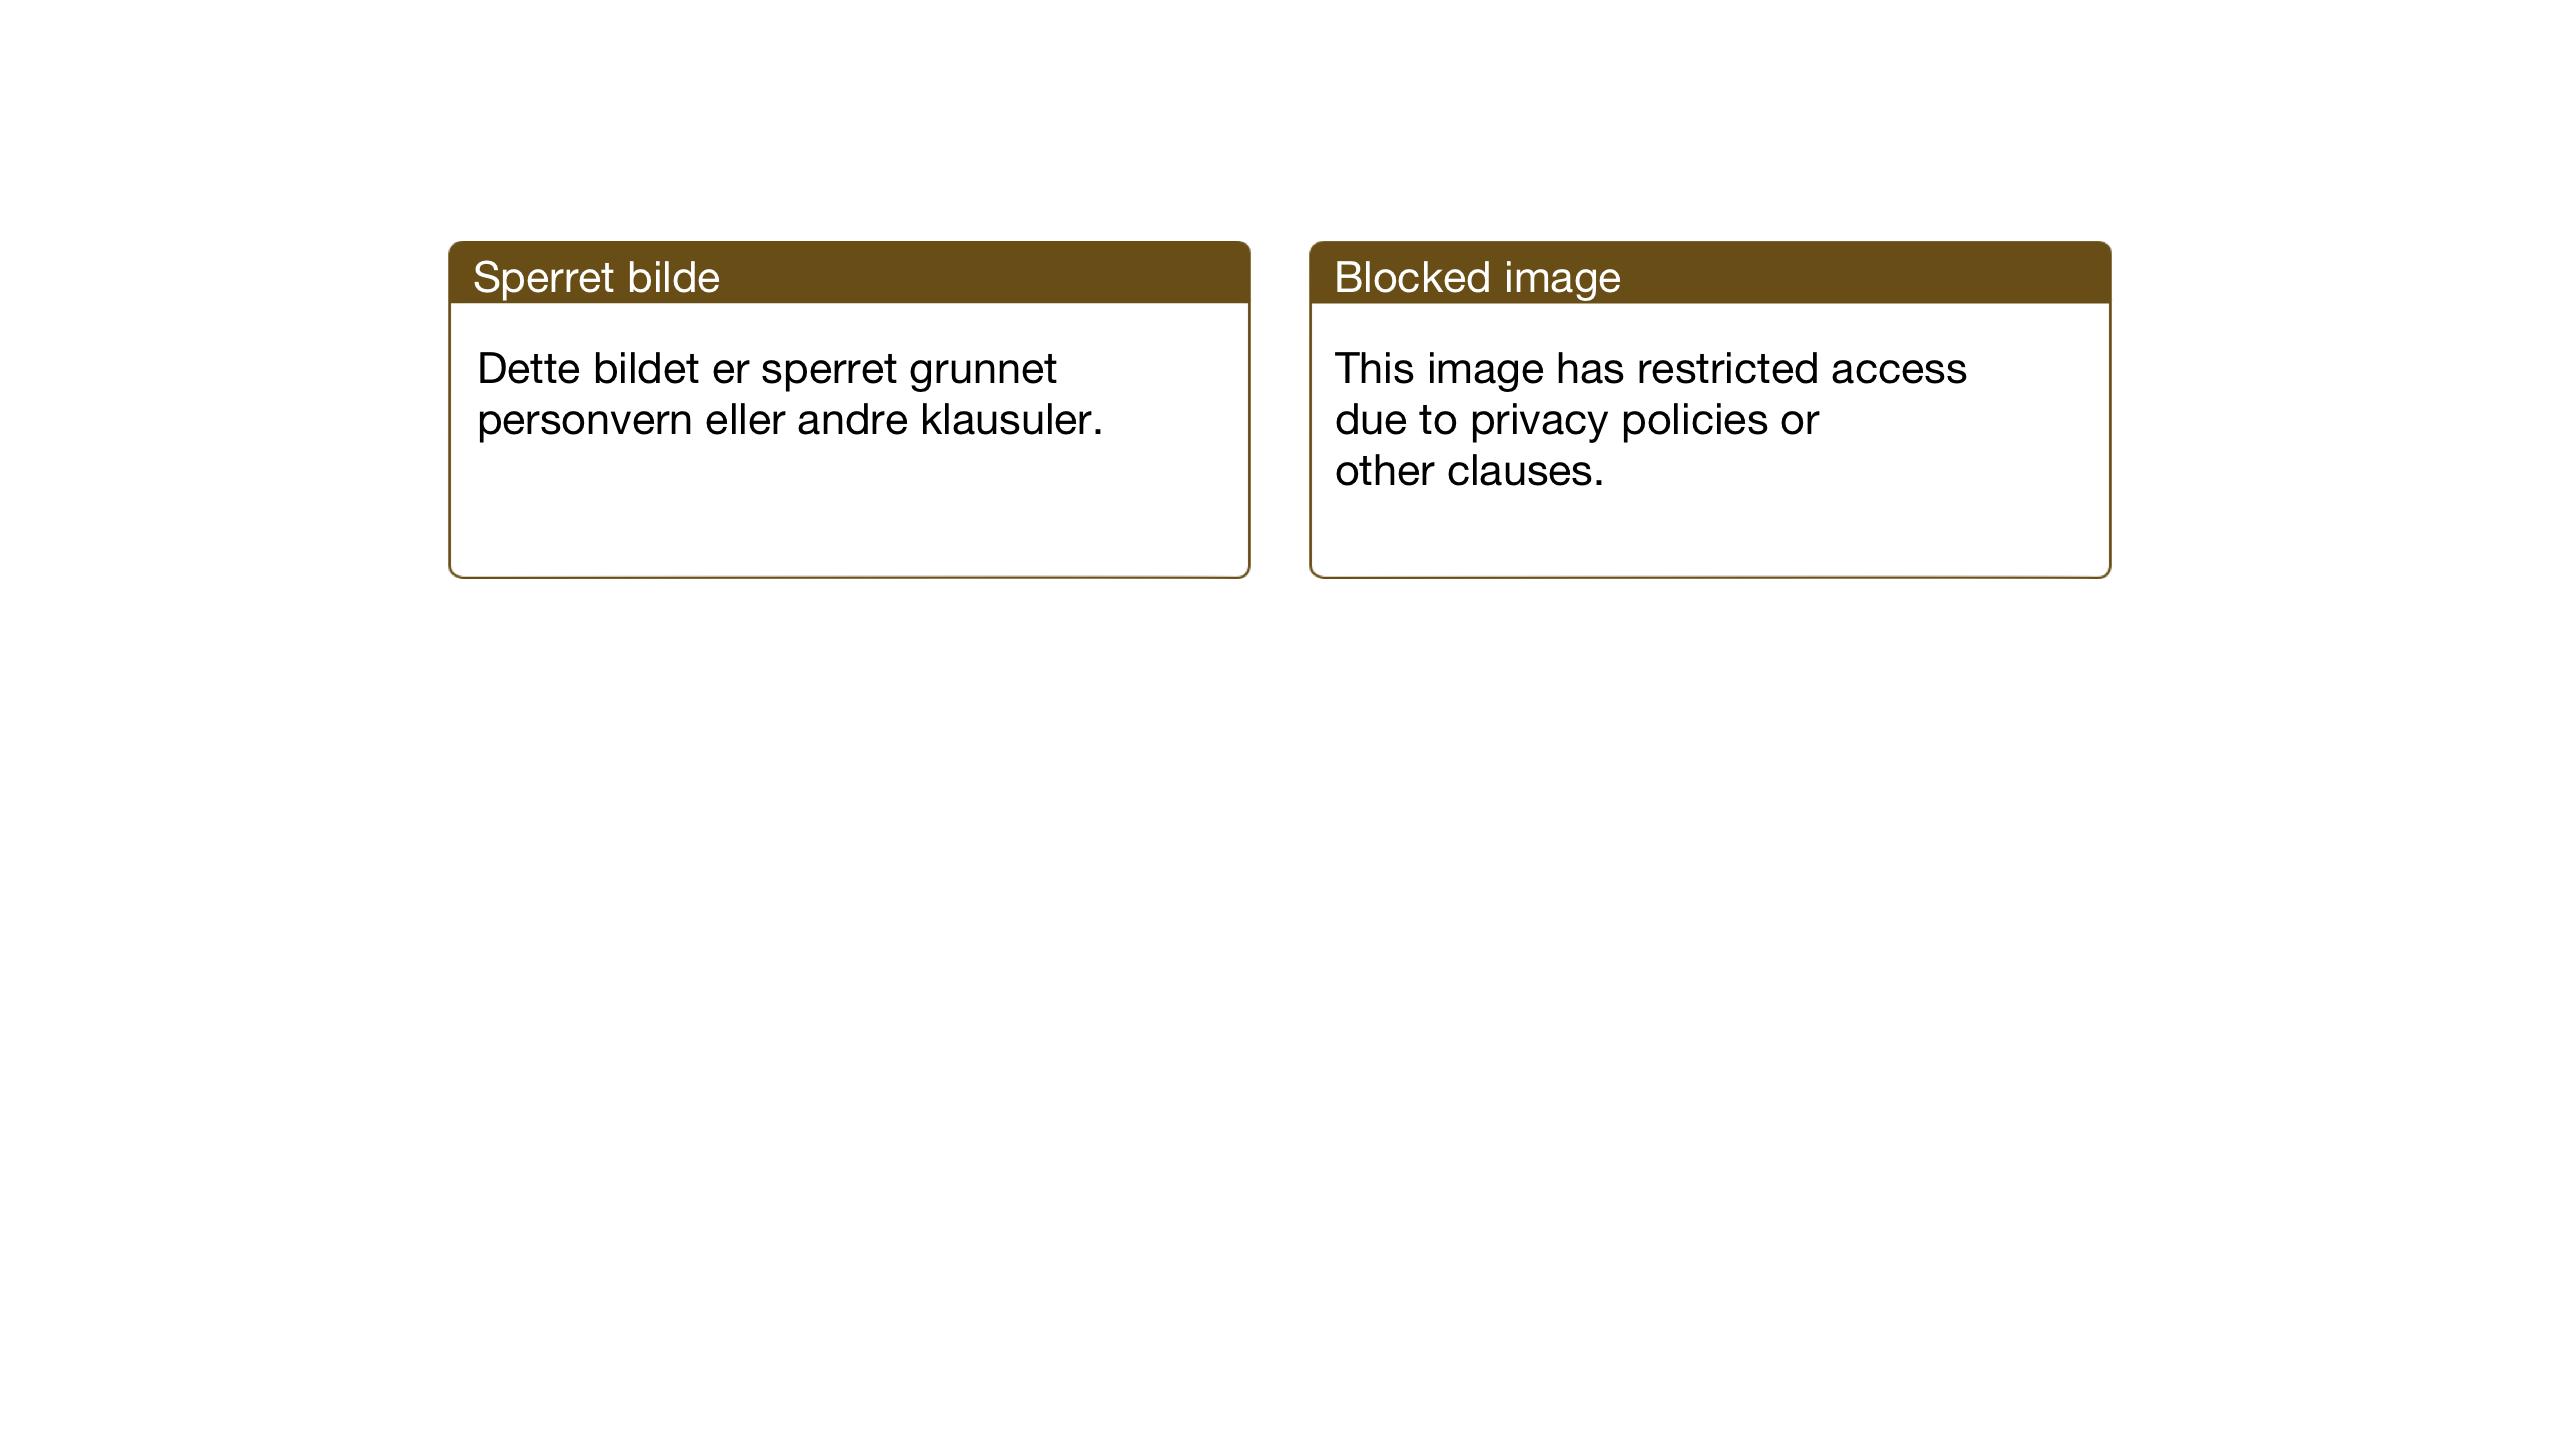 SAT, Ministerialprotokoller, klokkerbøker og fødselsregistre - Nordland, 847/L0680: Klokkerbok nr. 847C08, 1930-1947, s. 196